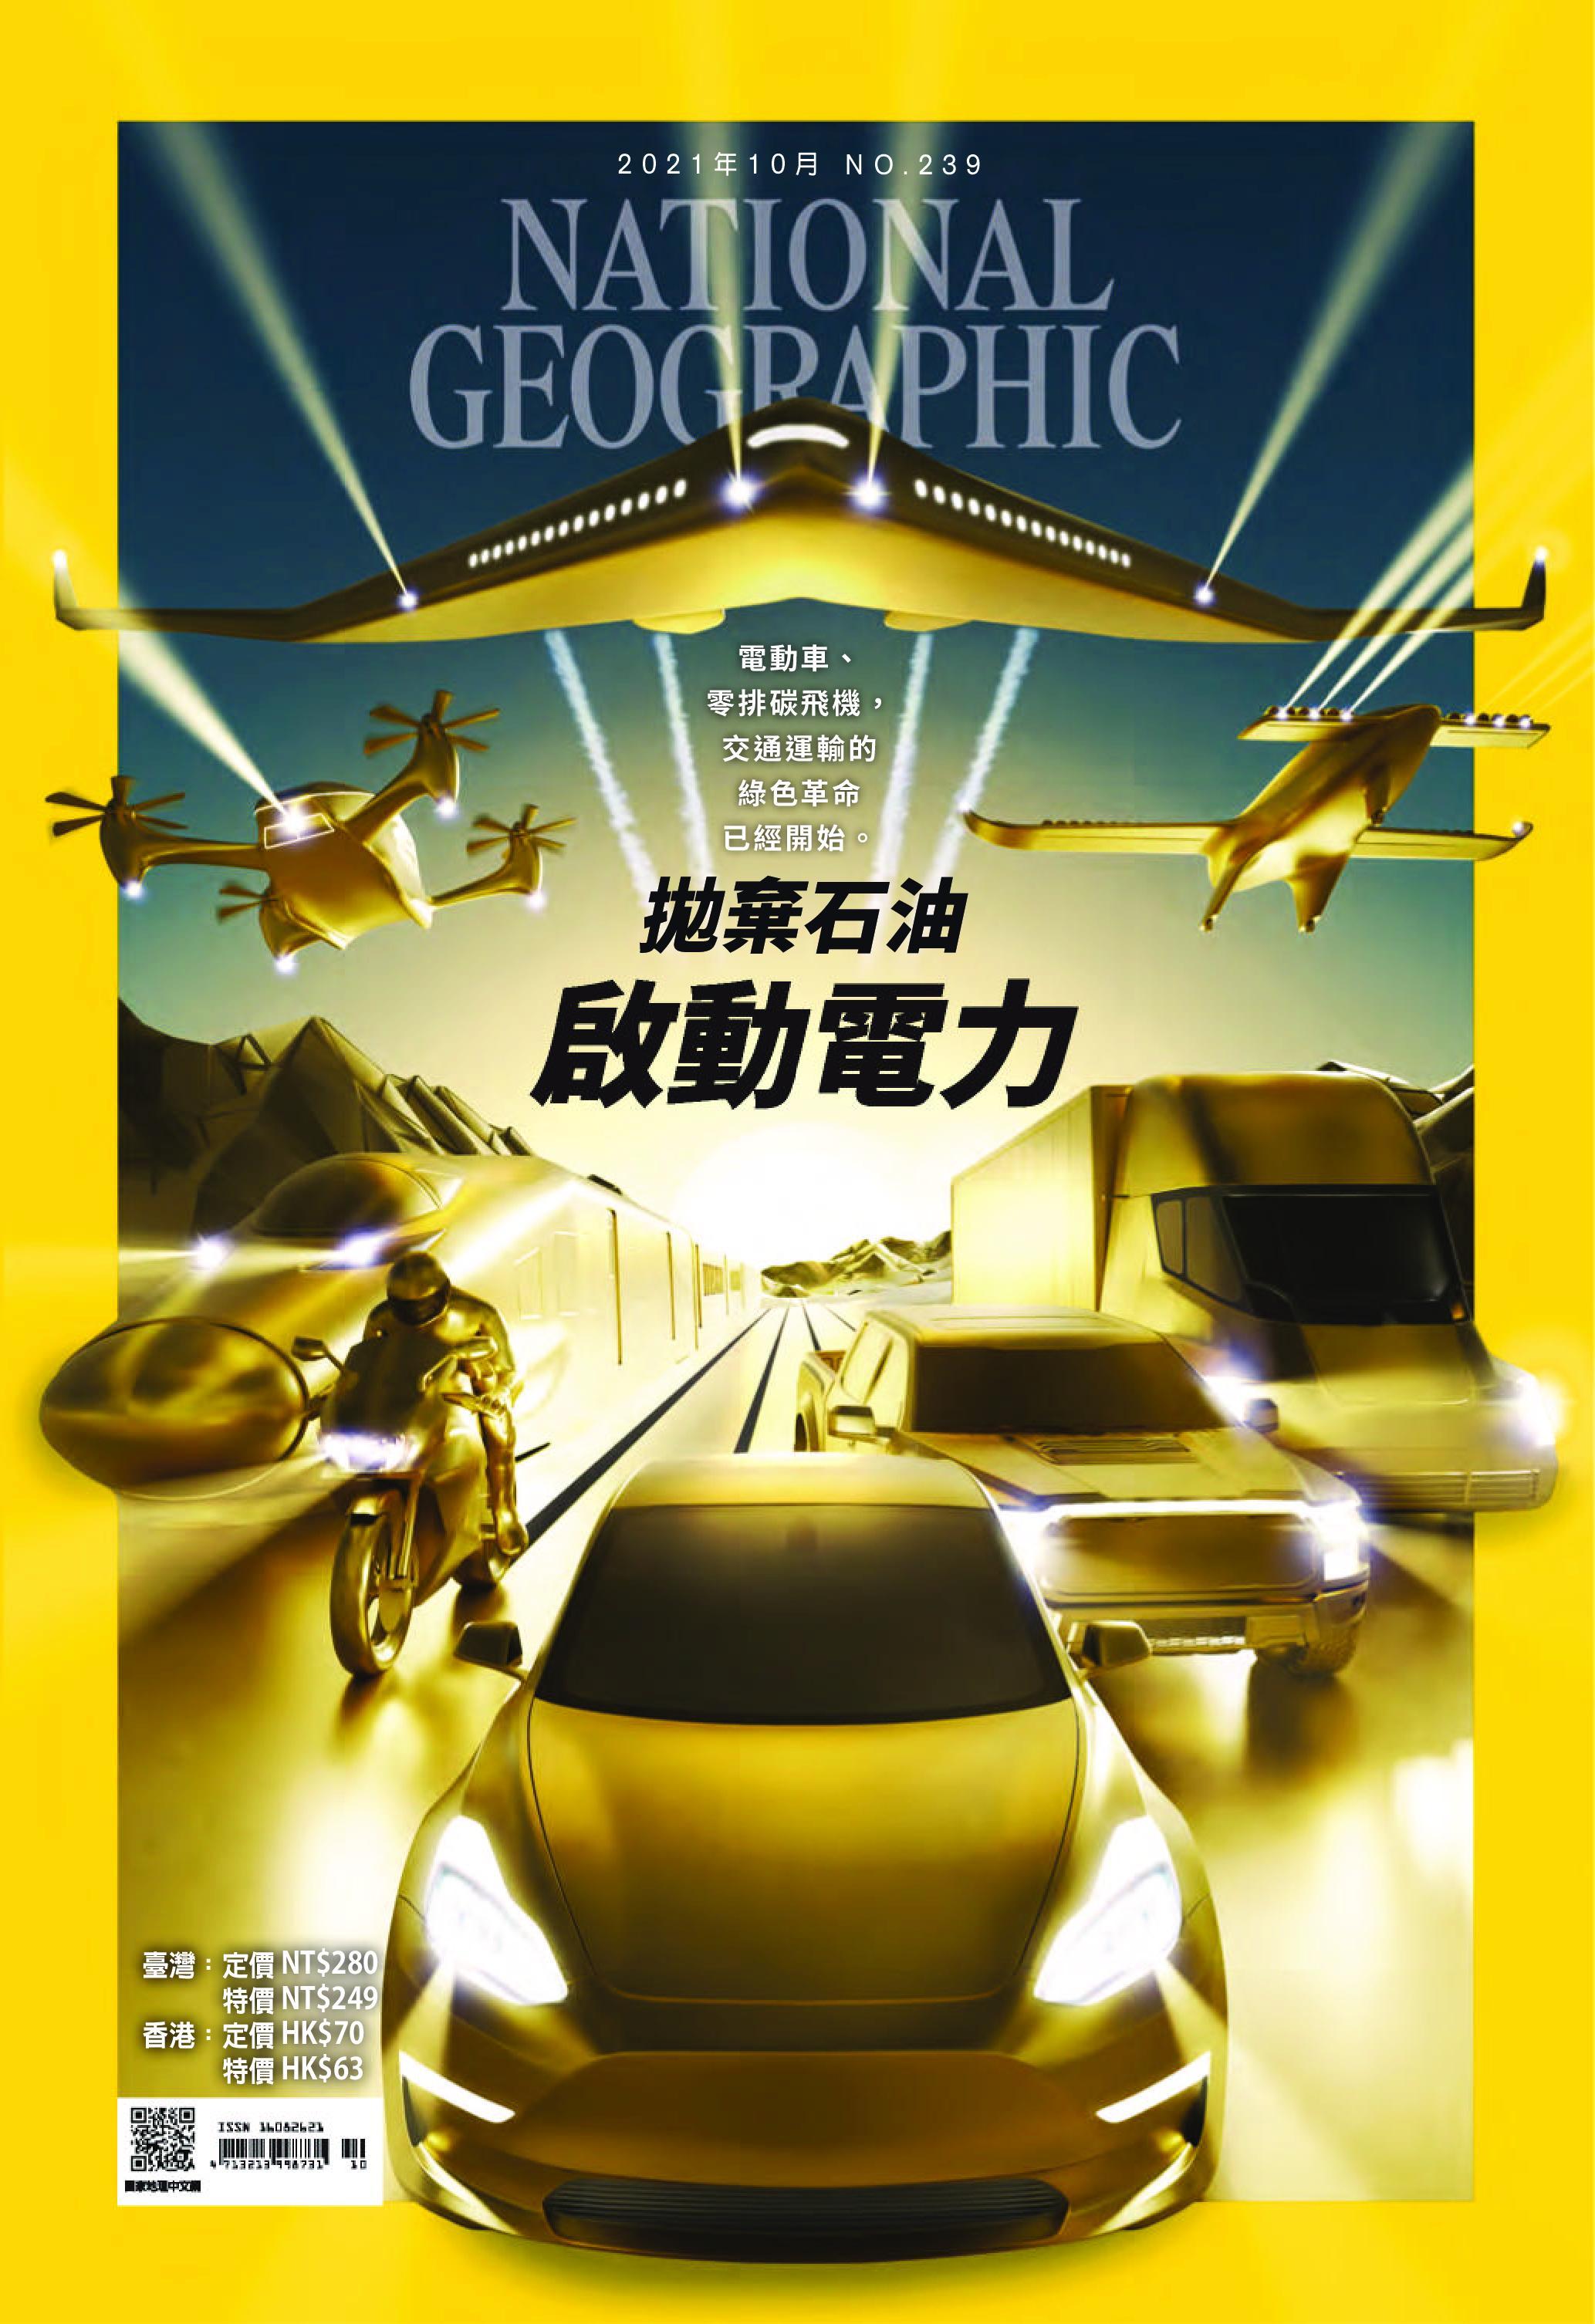 National Geographic Taiwan 國家地理雜誌中文版 - 十月 2021